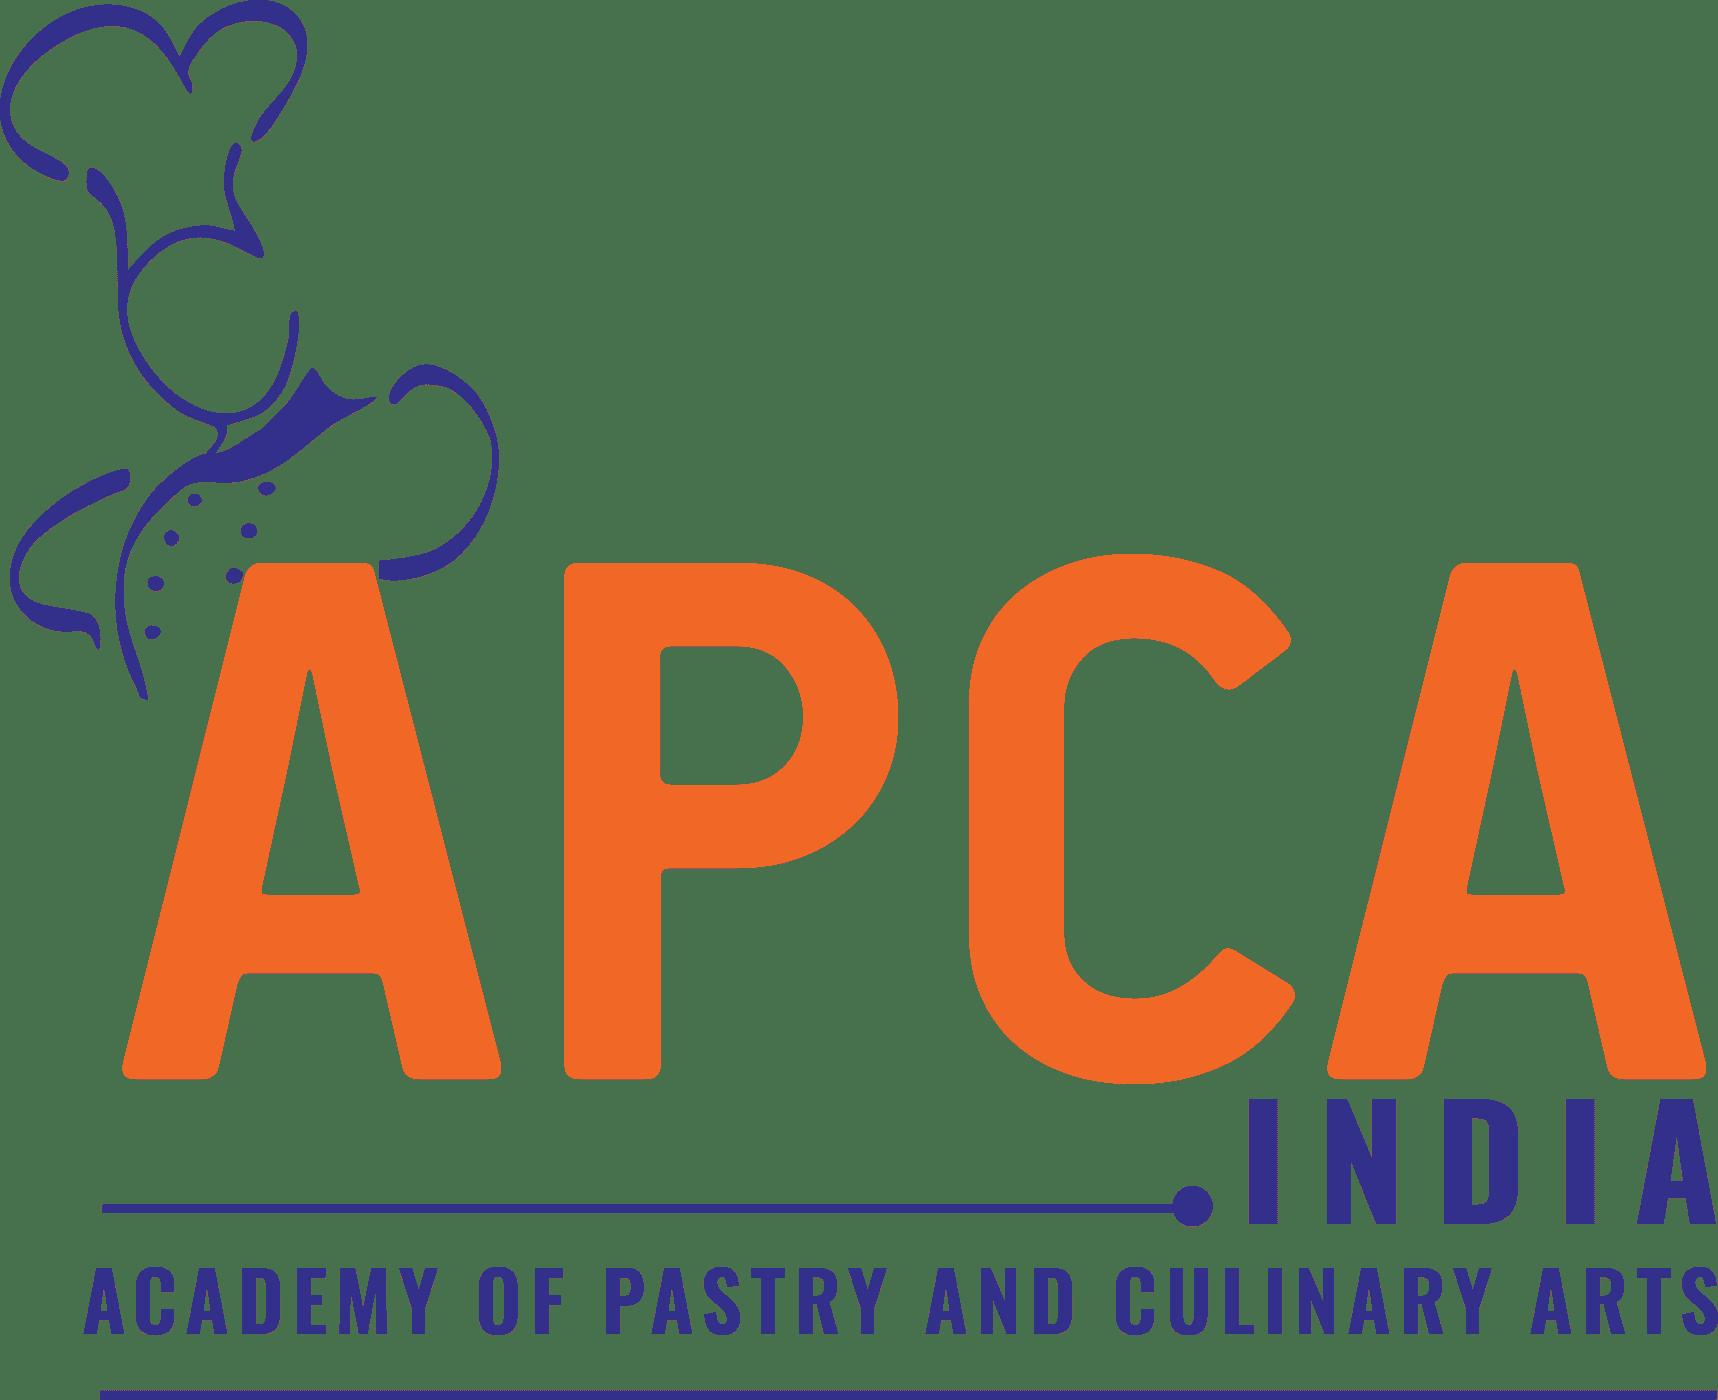 APCA India